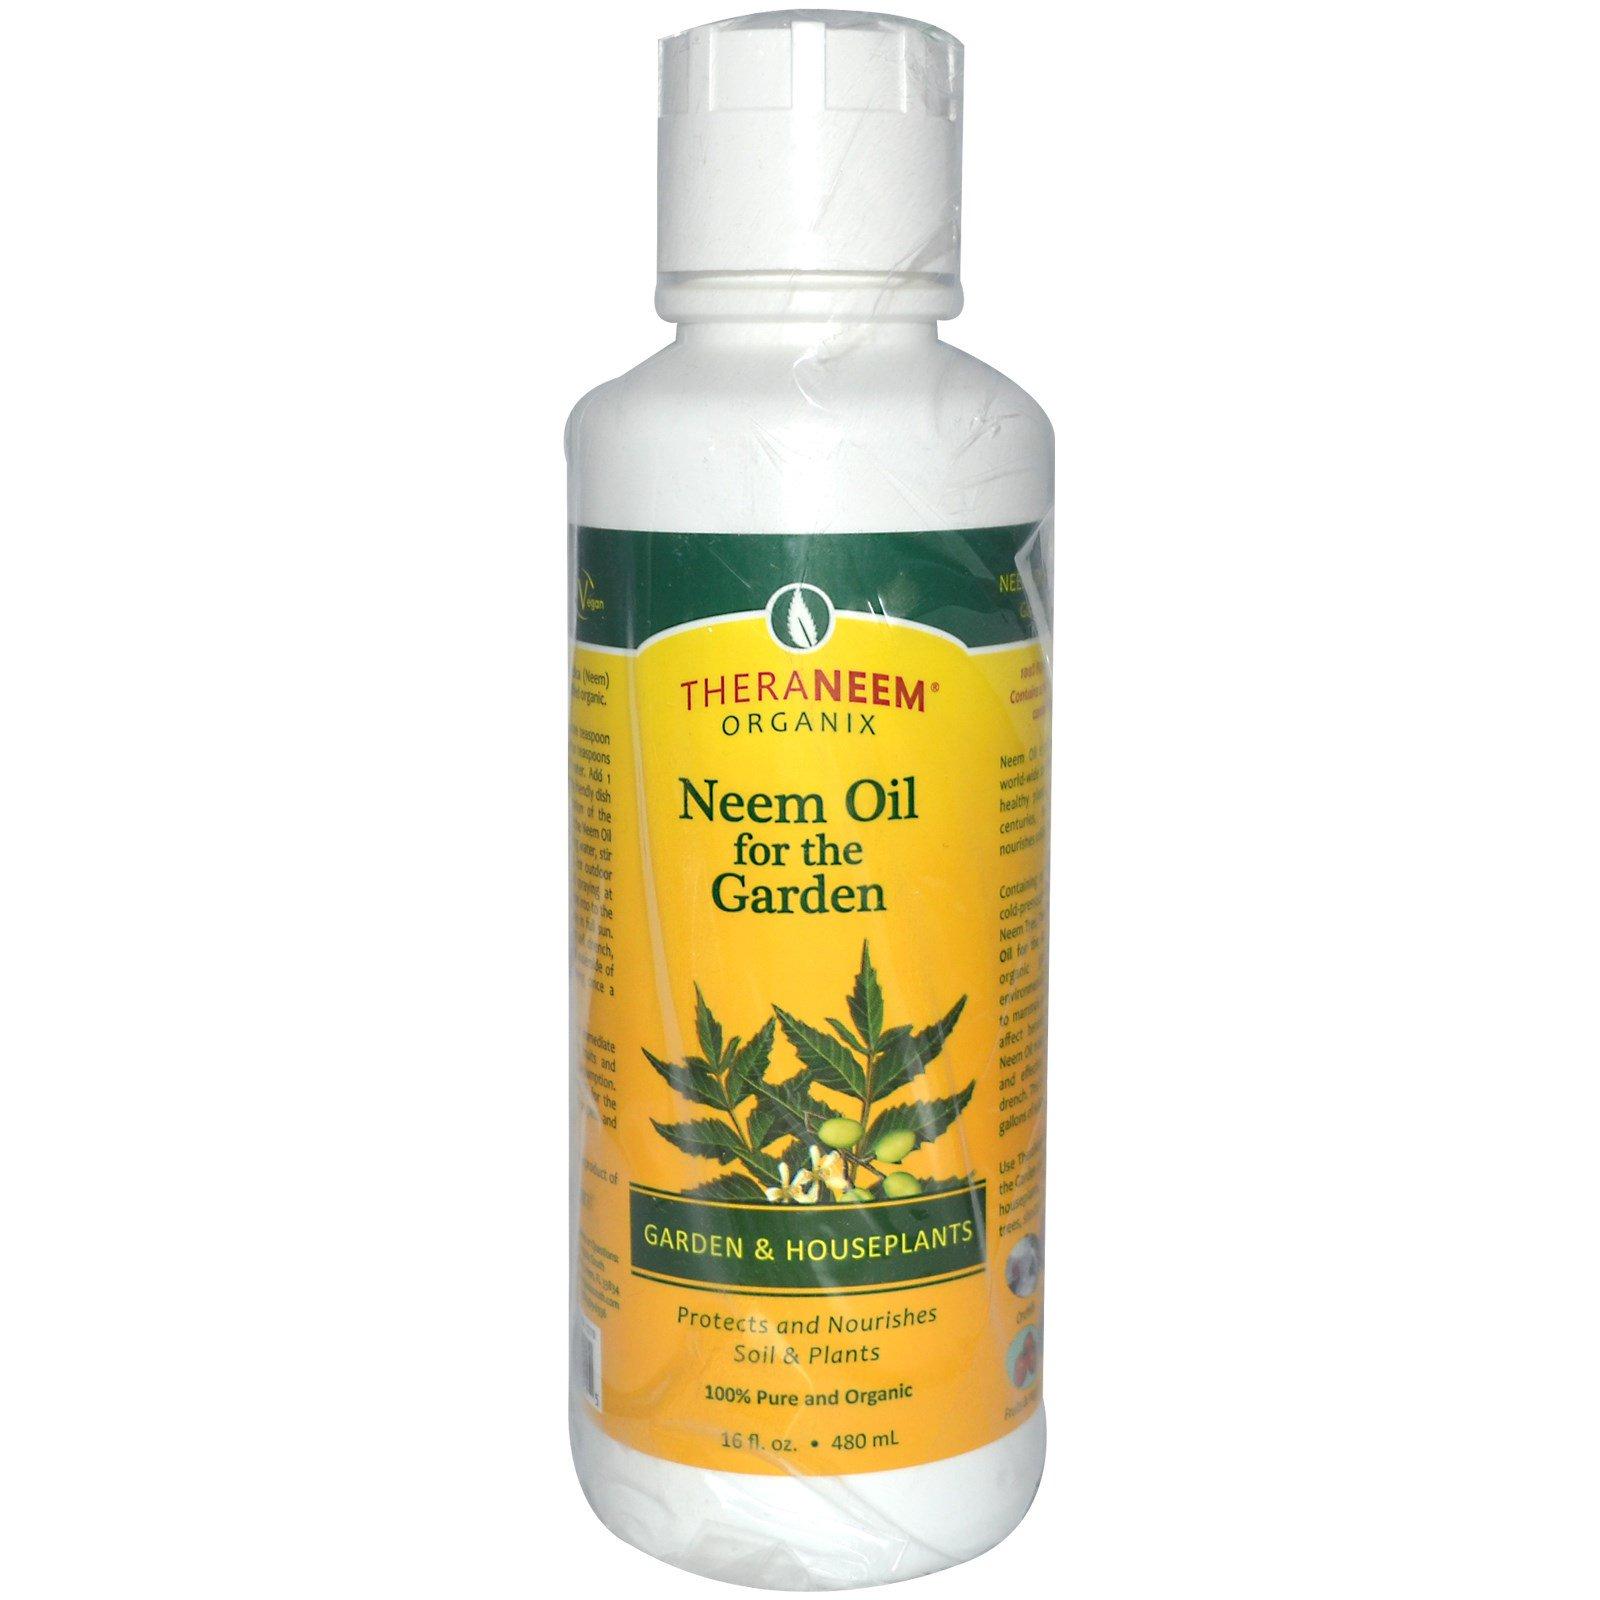 Organix South, TheraNeem Organix, Neem Oil for the Garden, Garden and Houseplants, 16 fl oz (480 ml)